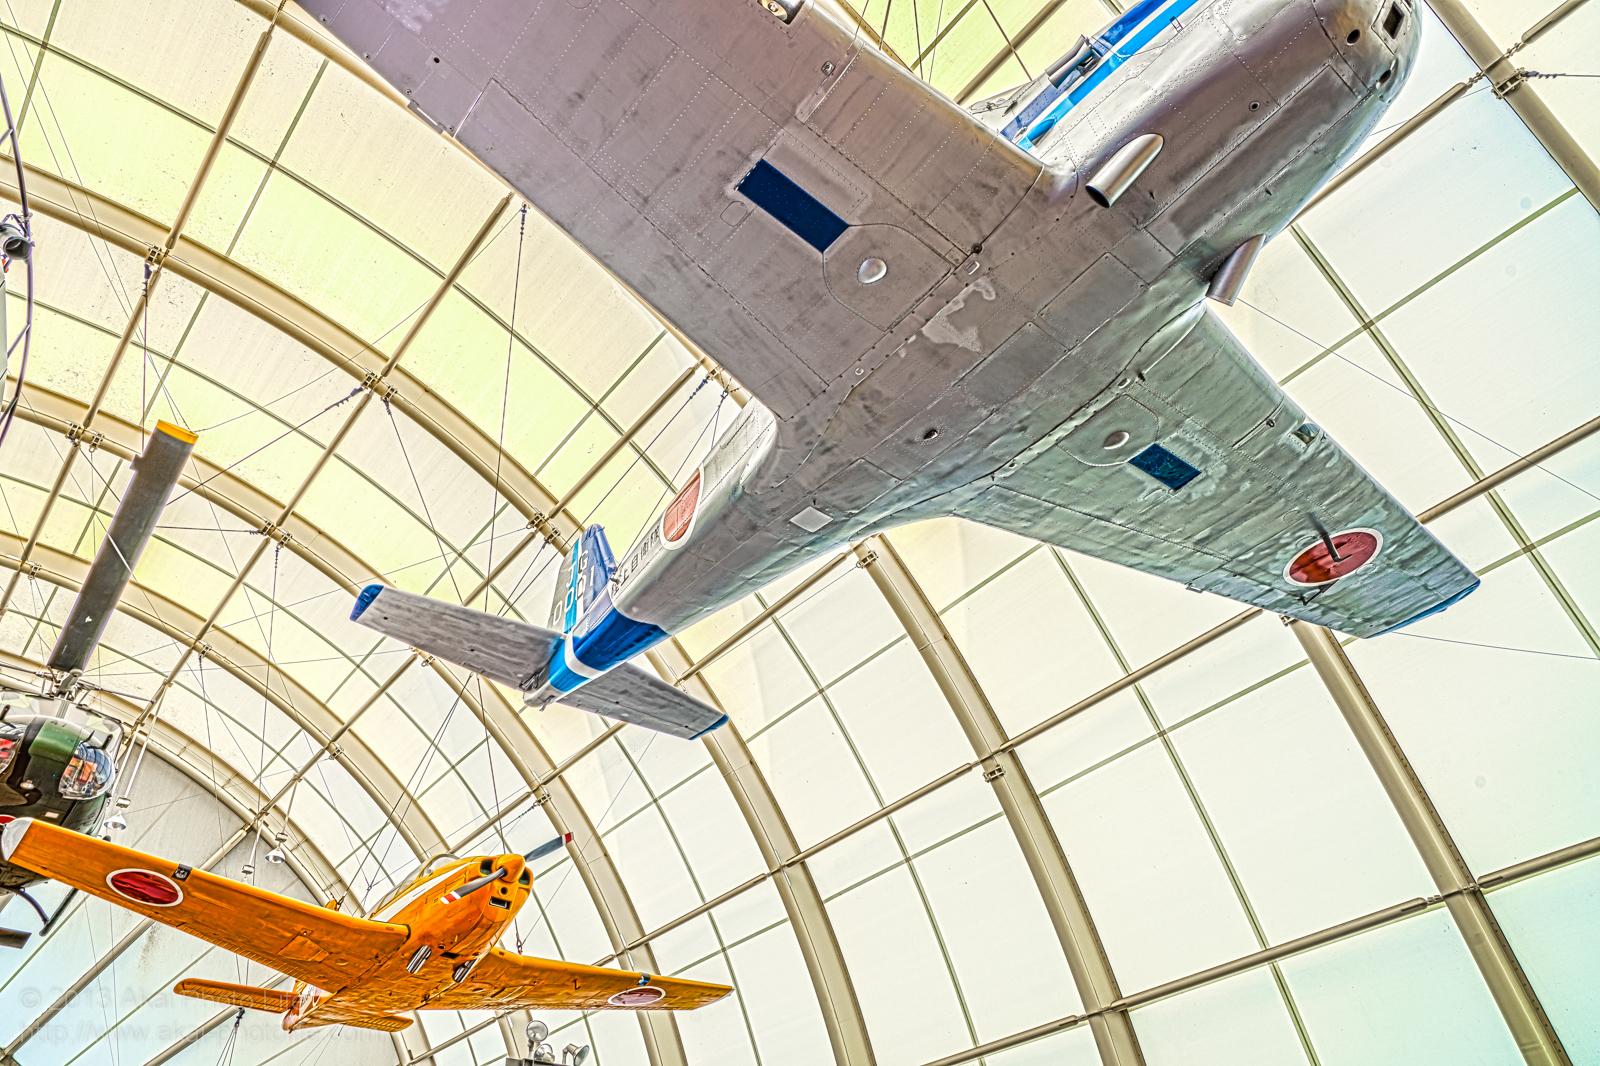 川崎 KAL-2の写真